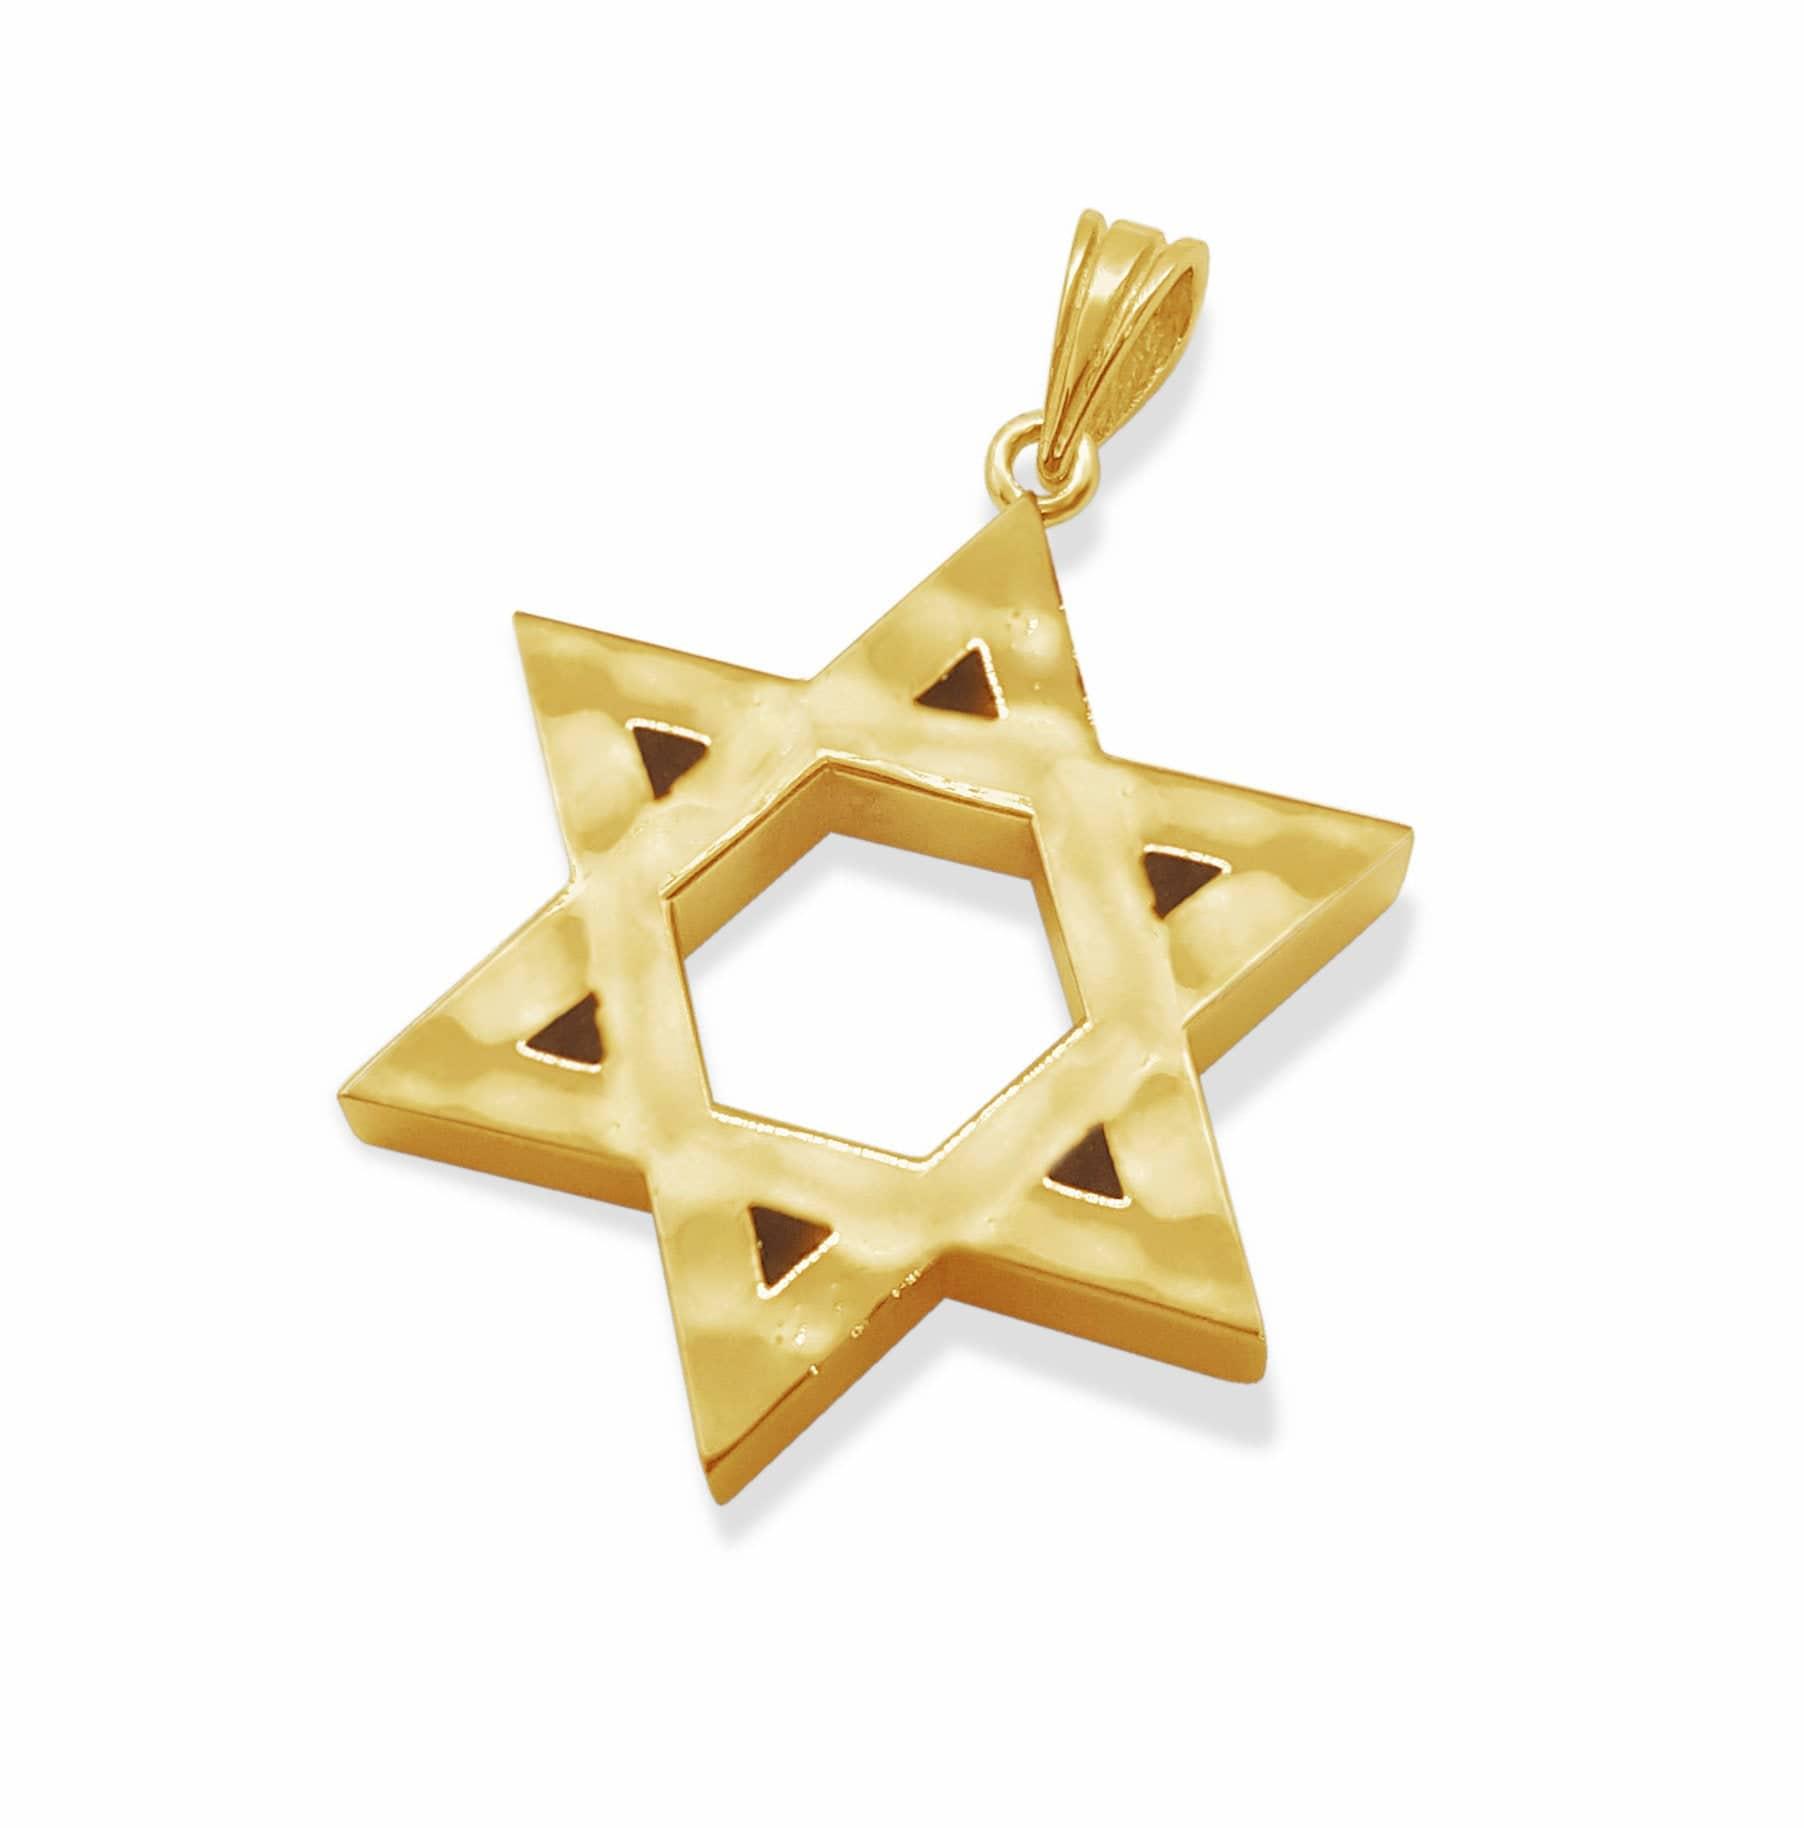 3D Hammered 14k White Gold Bold Star of David Pendant Necklace ,Gold Magen David Pendant Necklace